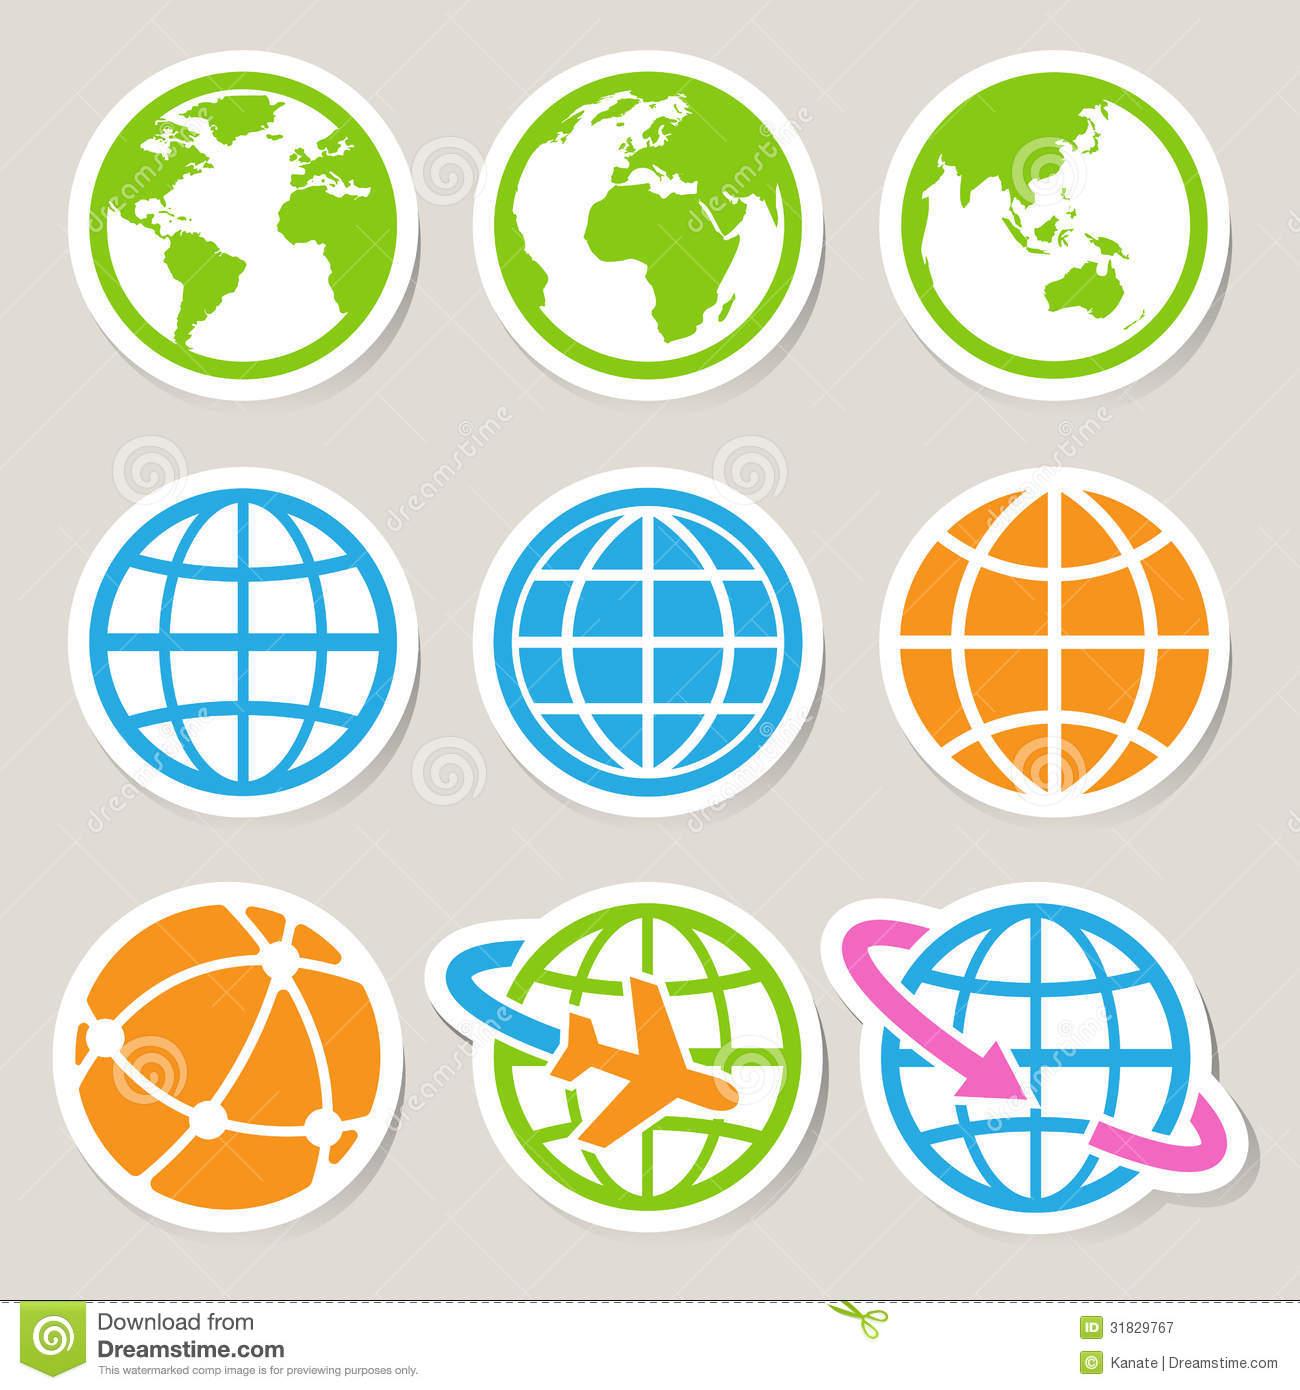 Google Earth Icon Set